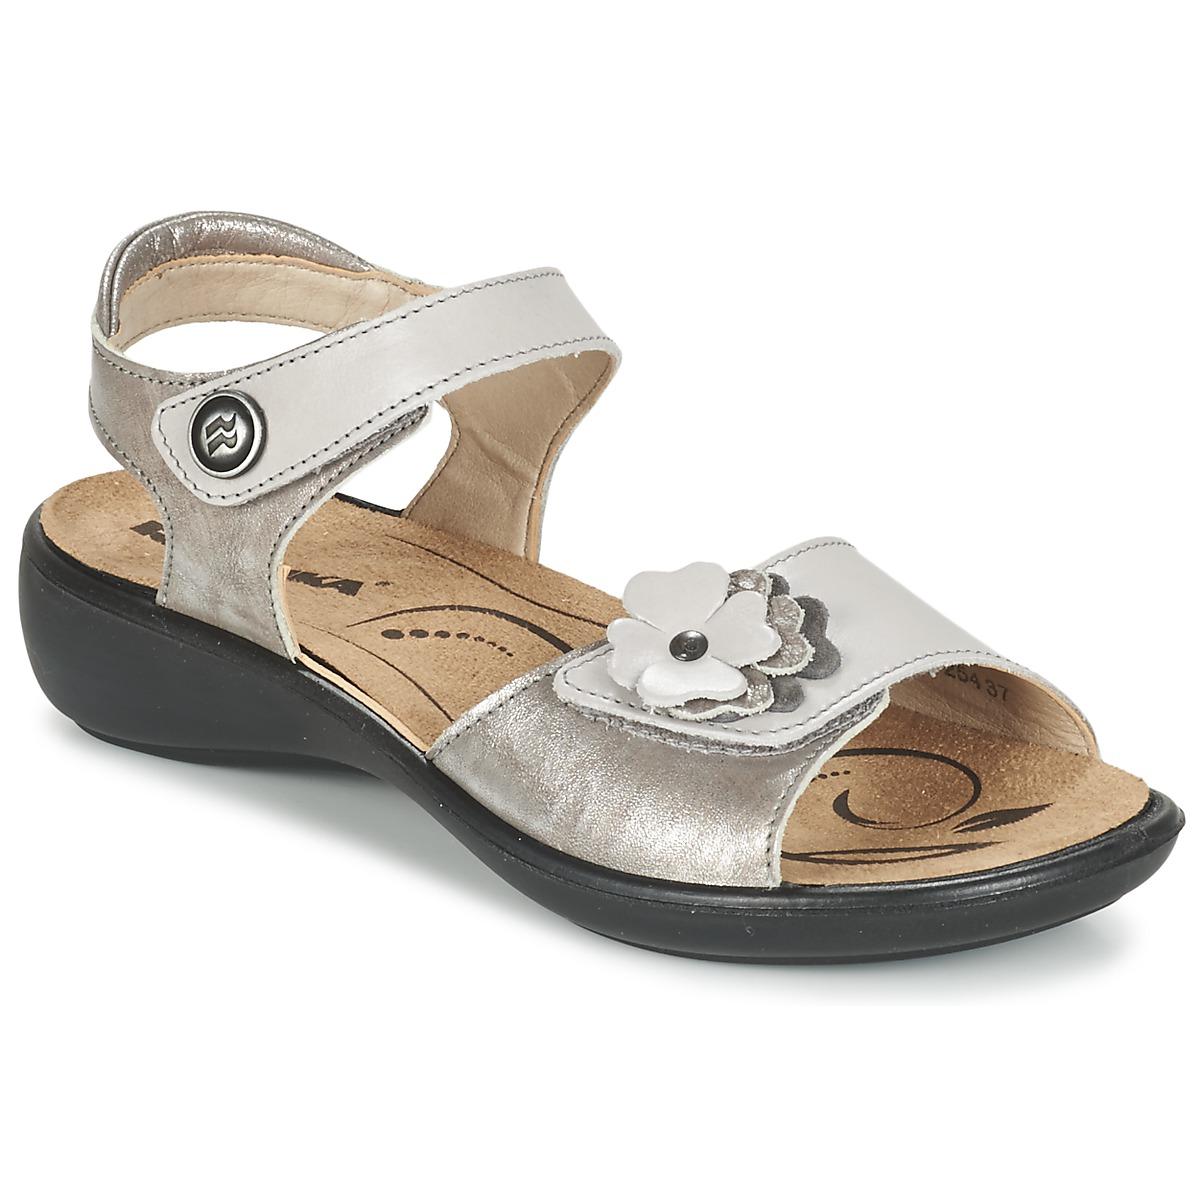 romika ibiza 67 argent chaussure pas cher avec chaussures sandale femme 78 99. Black Bedroom Furniture Sets. Home Design Ideas